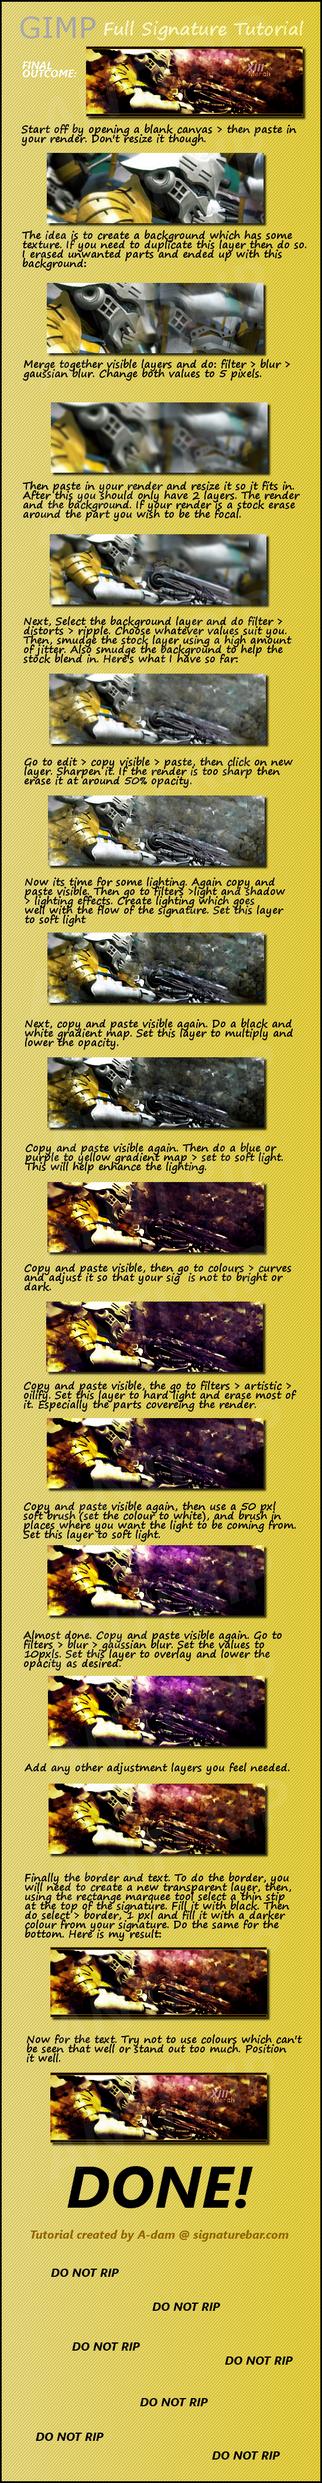 GIMP signature tutorial by Shallowmede-X